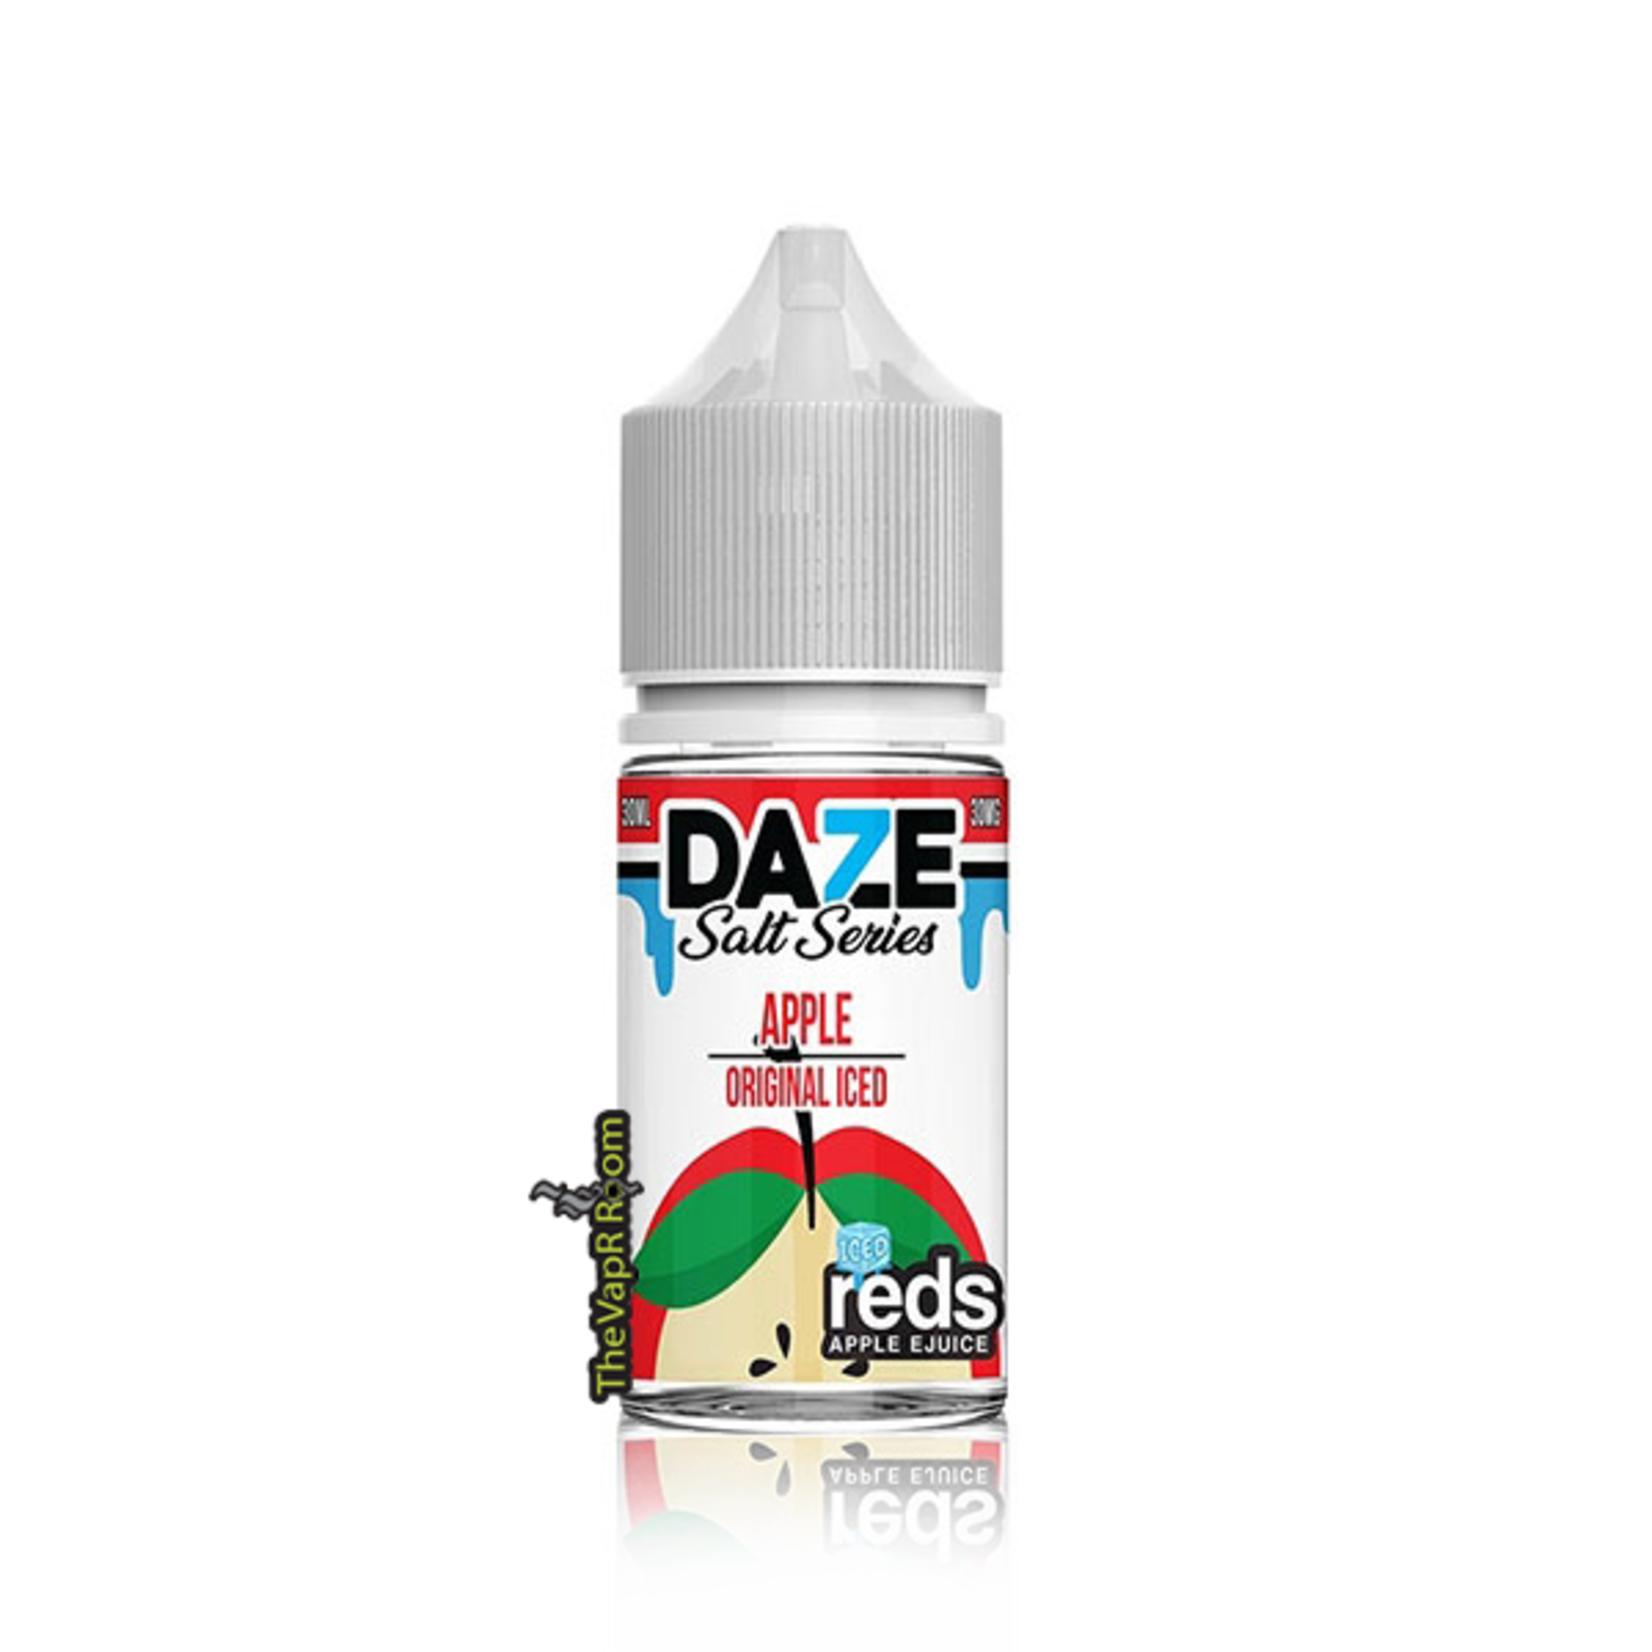 7 Daze Reds Apple Iced Salt